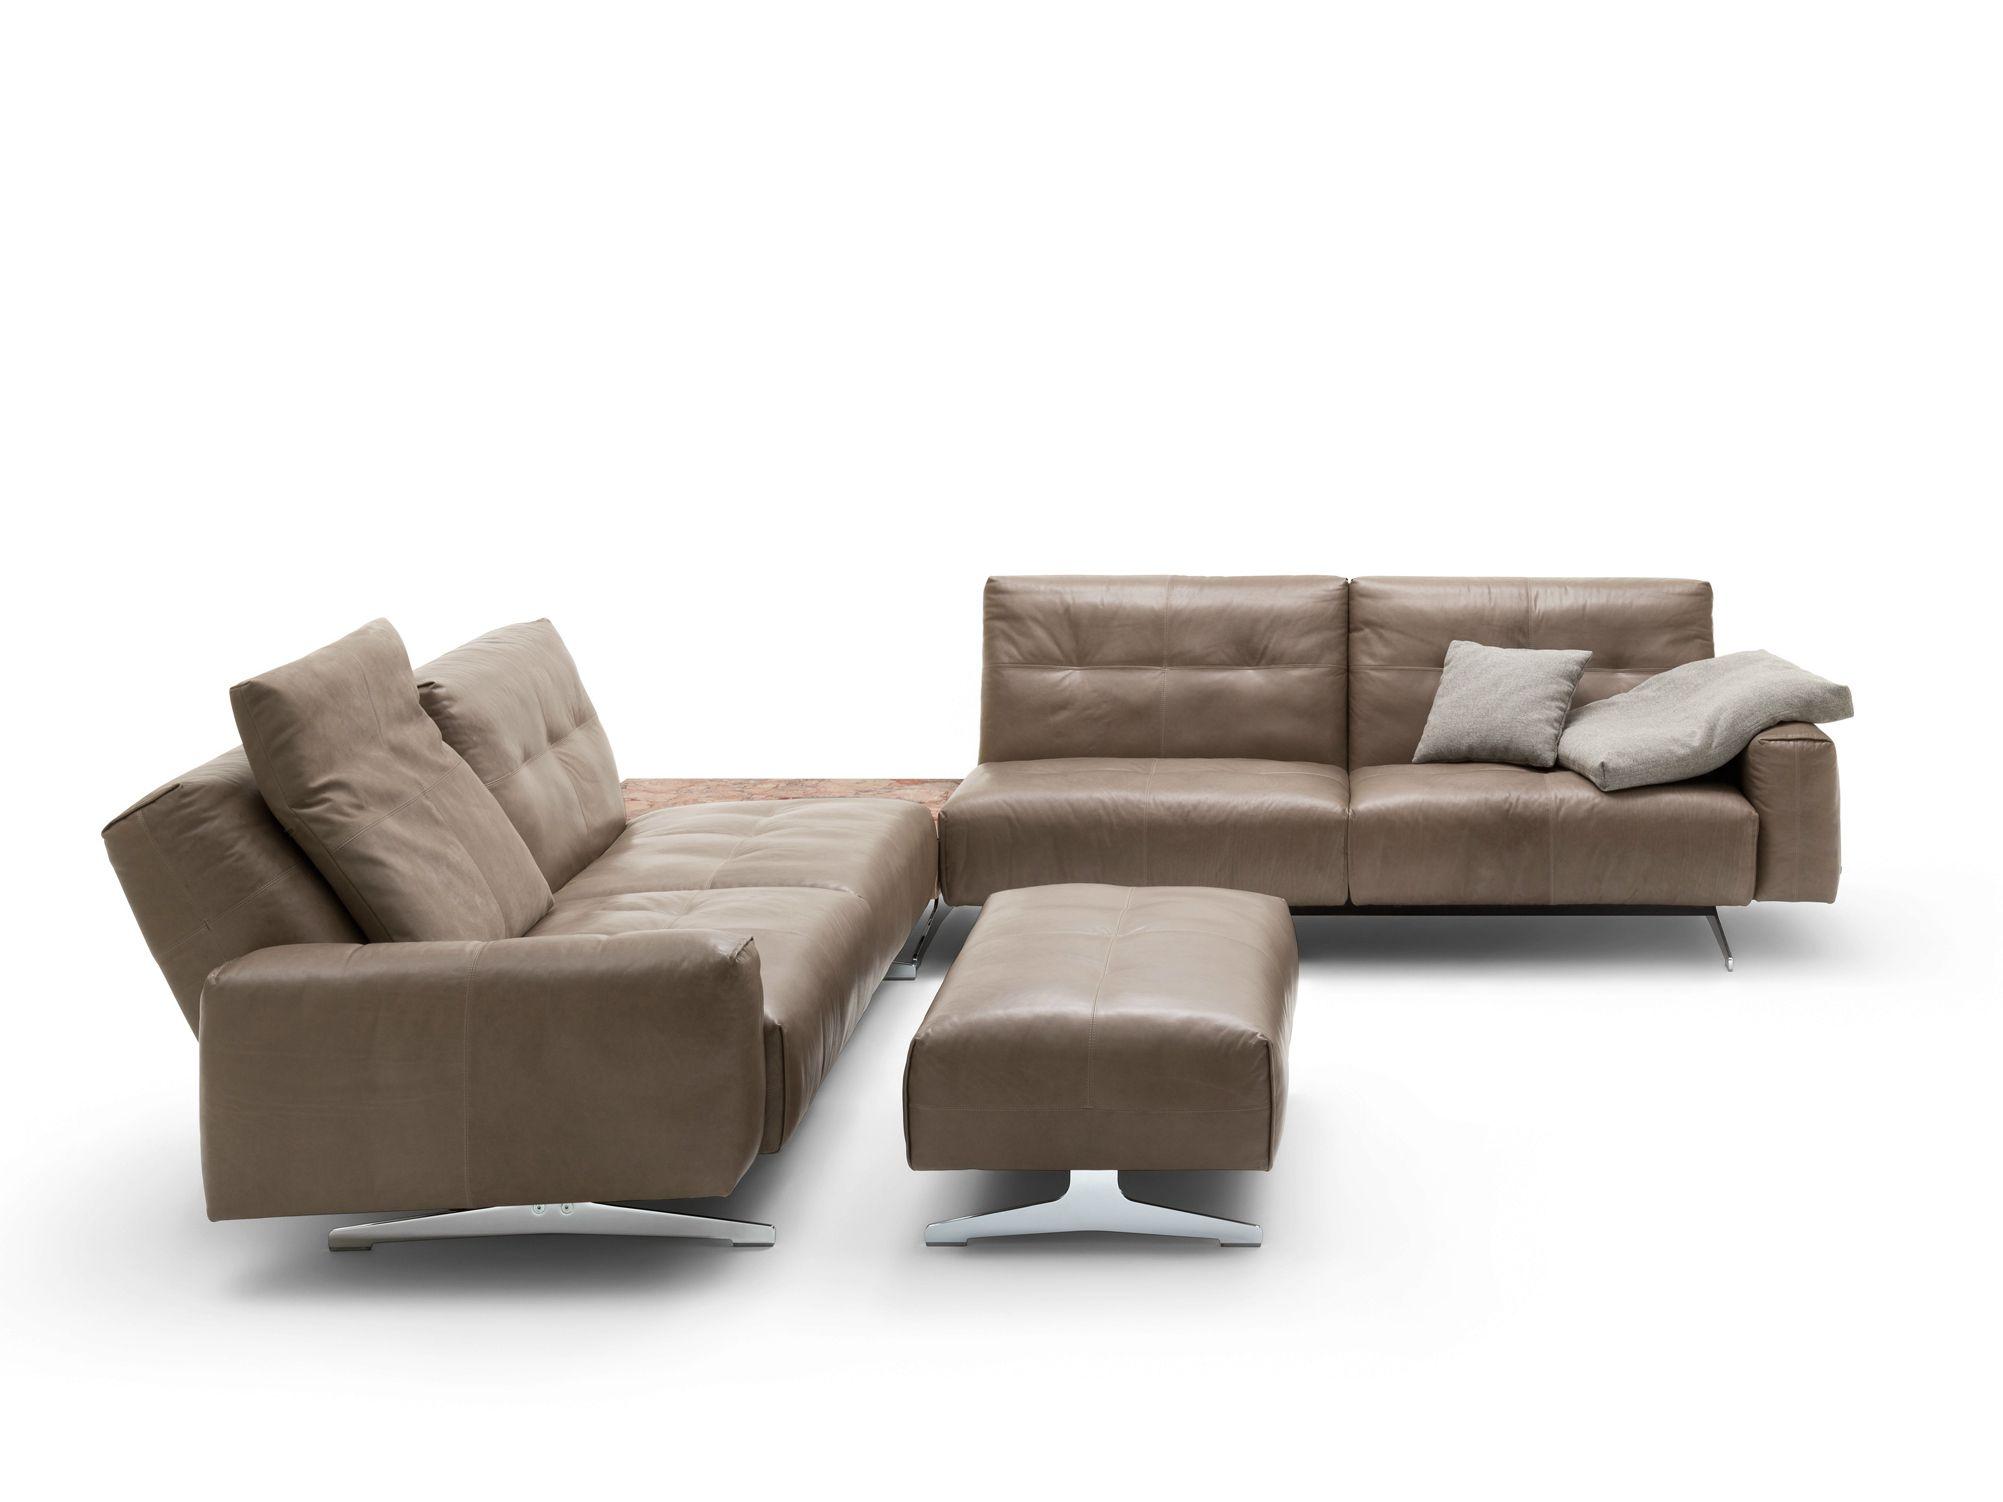 Bemerkenswert Sofa Benz Beste Wahl Rolf 50 - Fy And Nice Couch